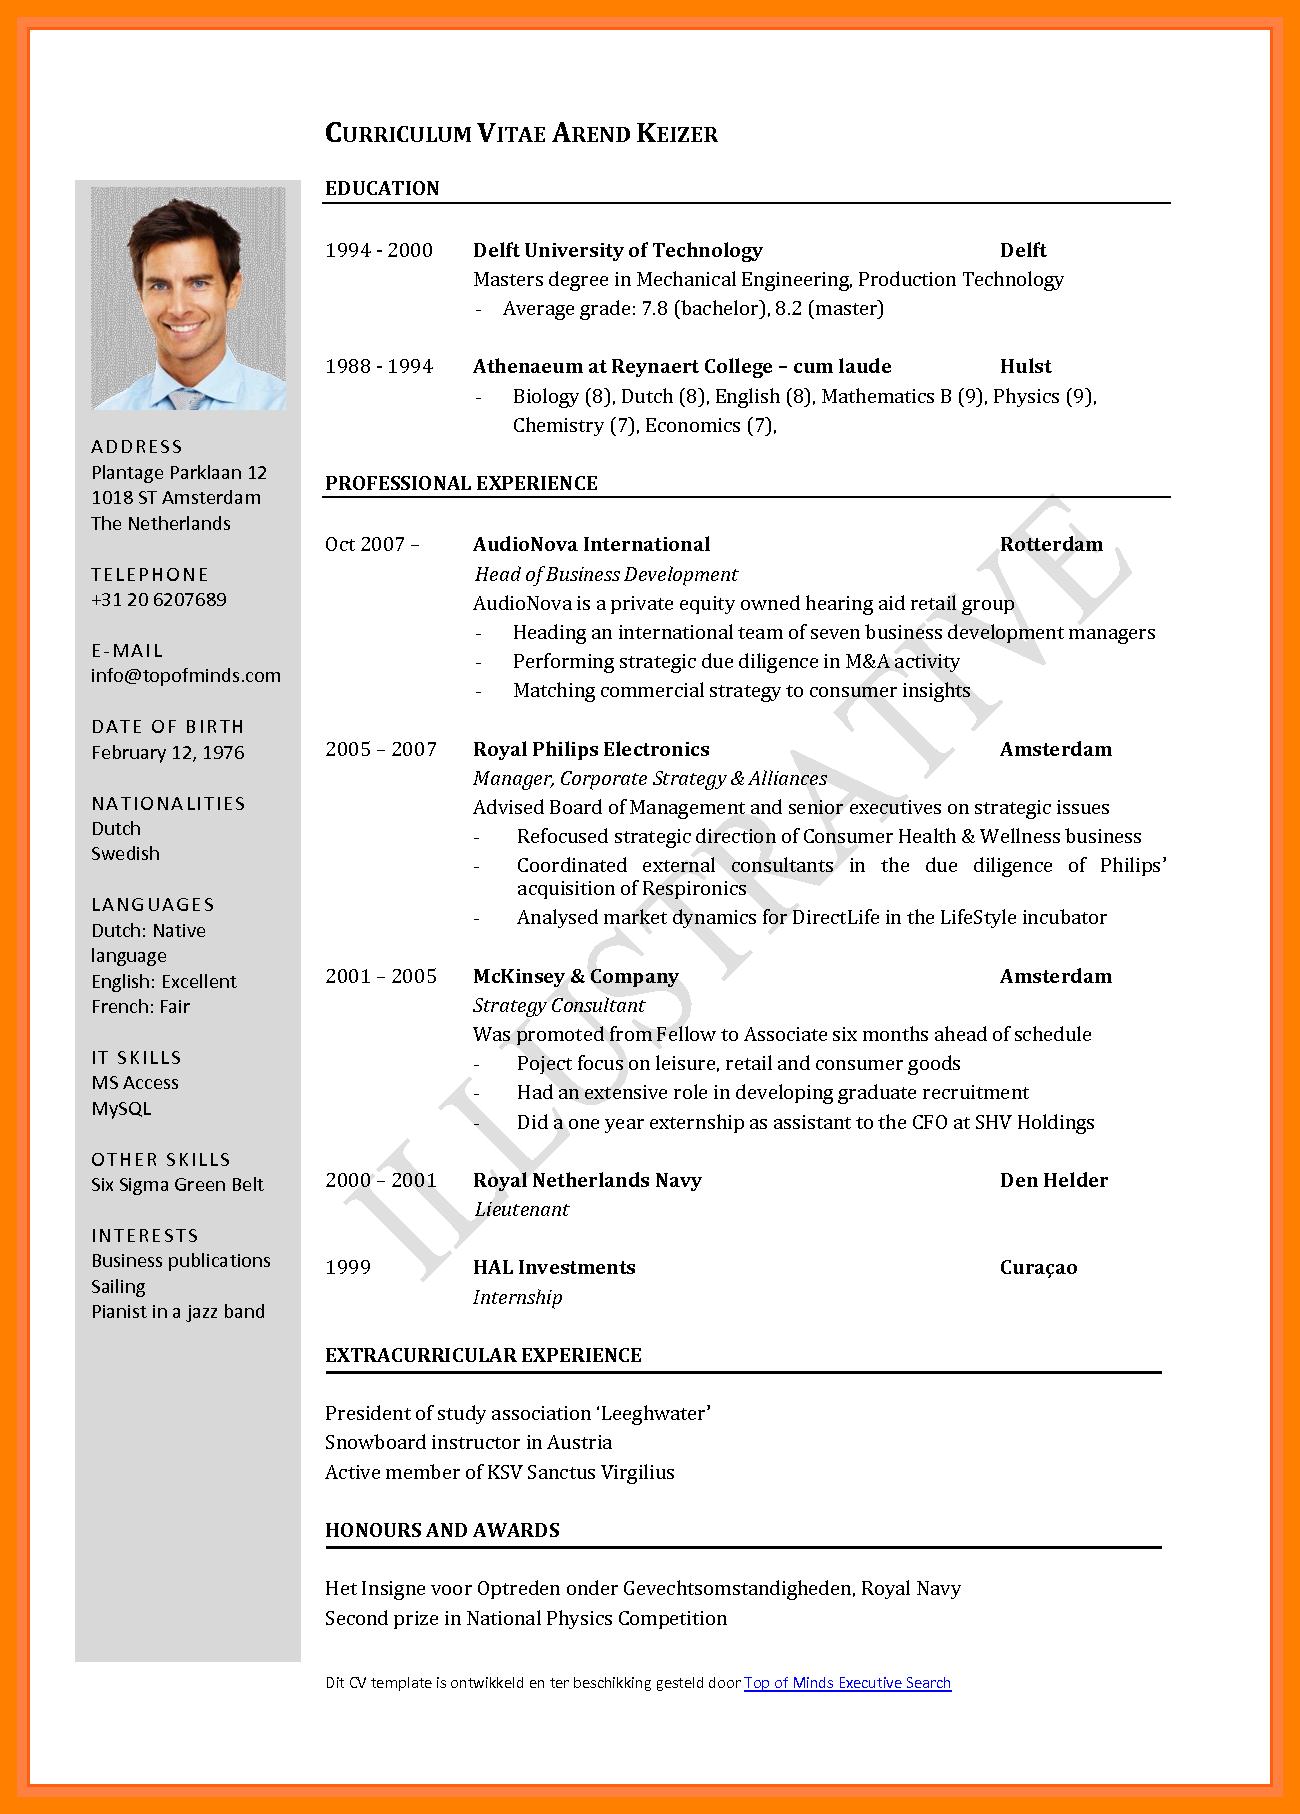 7 Curriculum Vitae Format 2017 Teller Resume New Cv Format 2017 Sample Resume Format Curriculum Vitae Format Job Resume Format